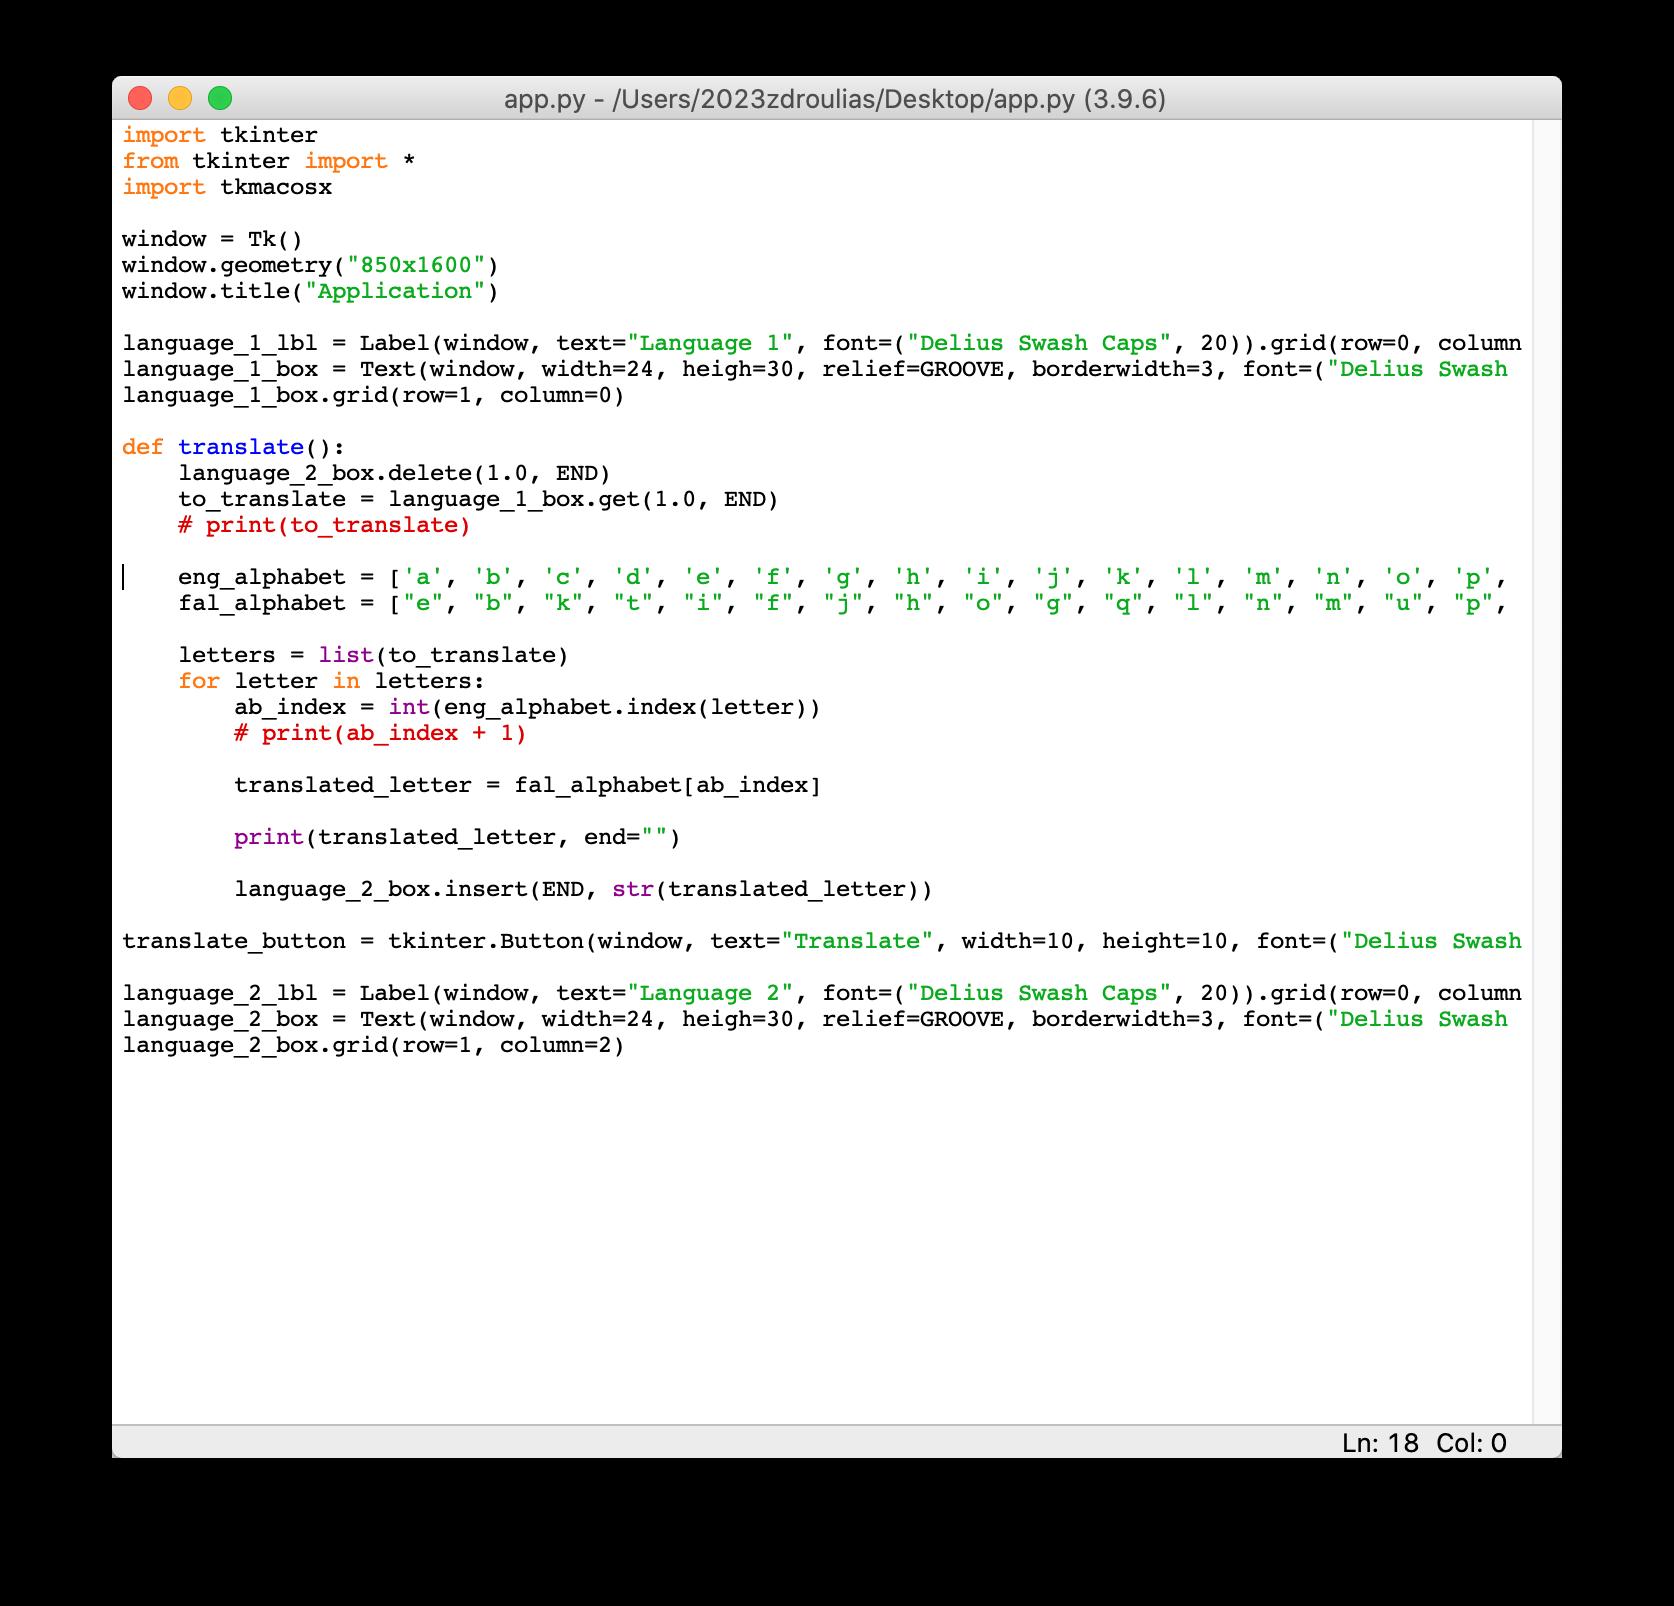 https://cloud-ma55g9e9j-hack-club-bot.vercel.app/0translator_code.png